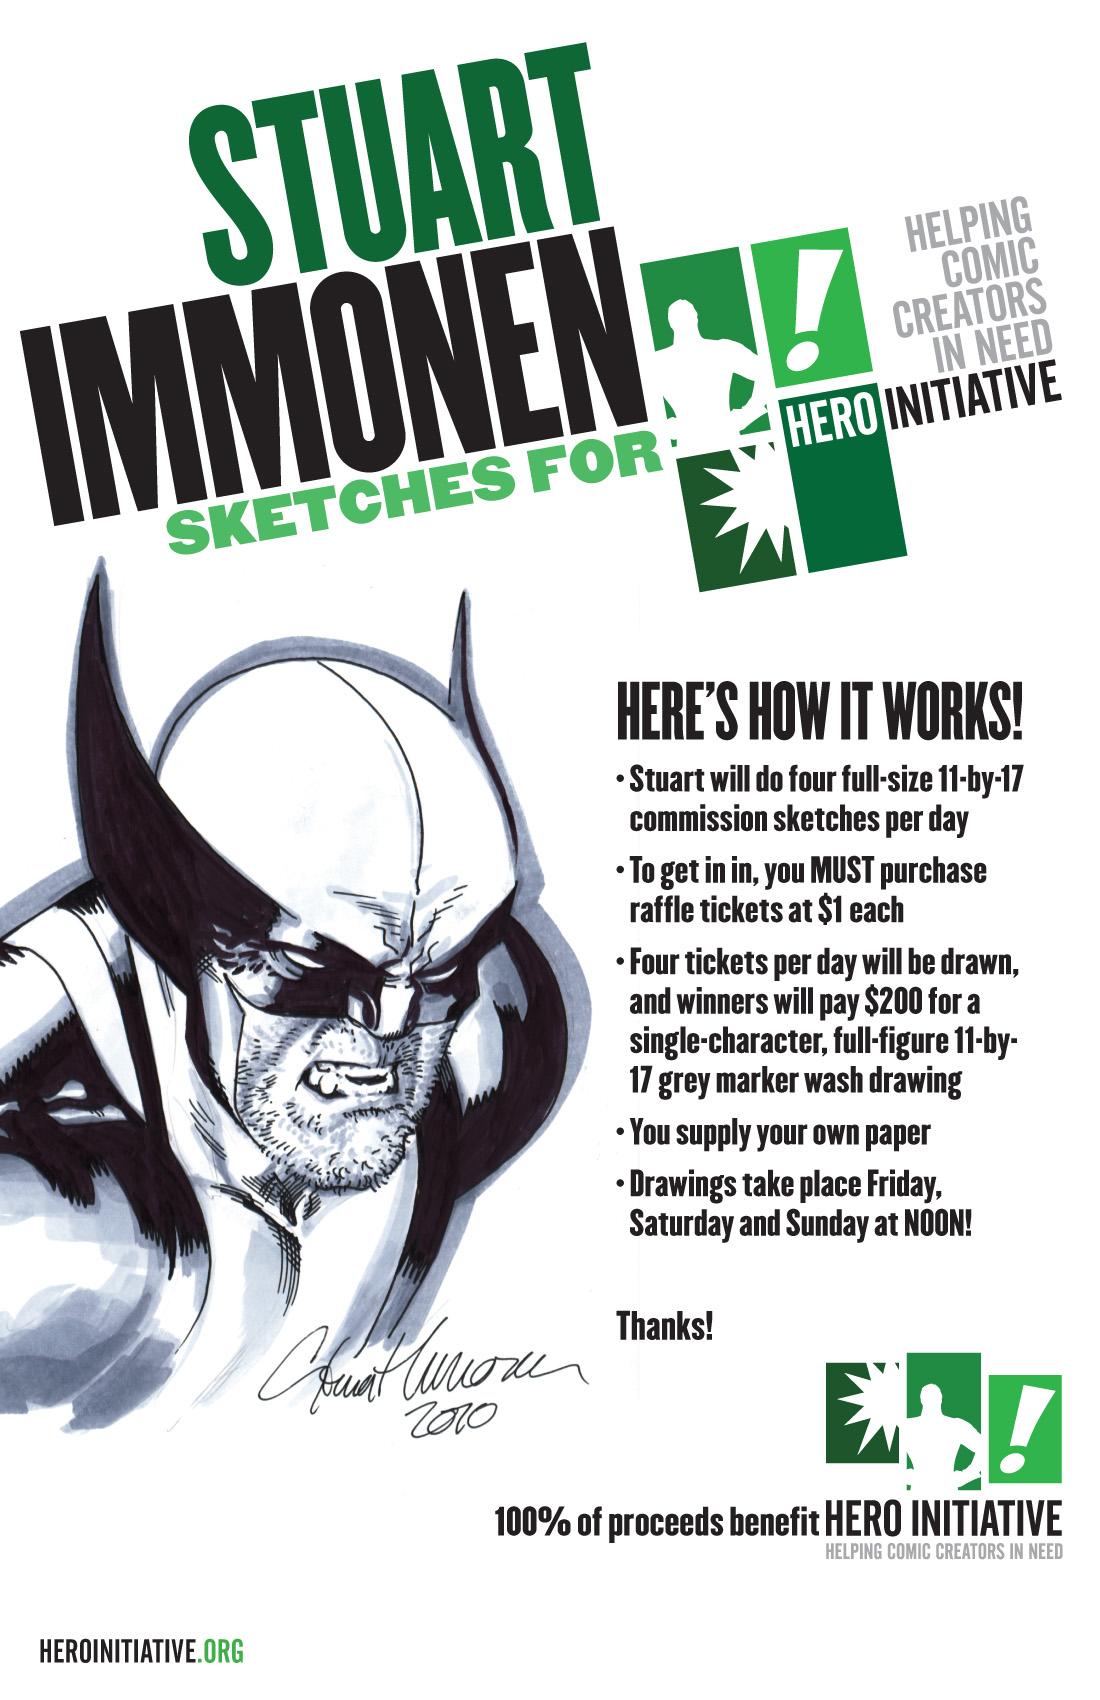 hero_sign_immonen_01_zP Hero Initiative celebrates Memorial Day at Phoenix Comic Con